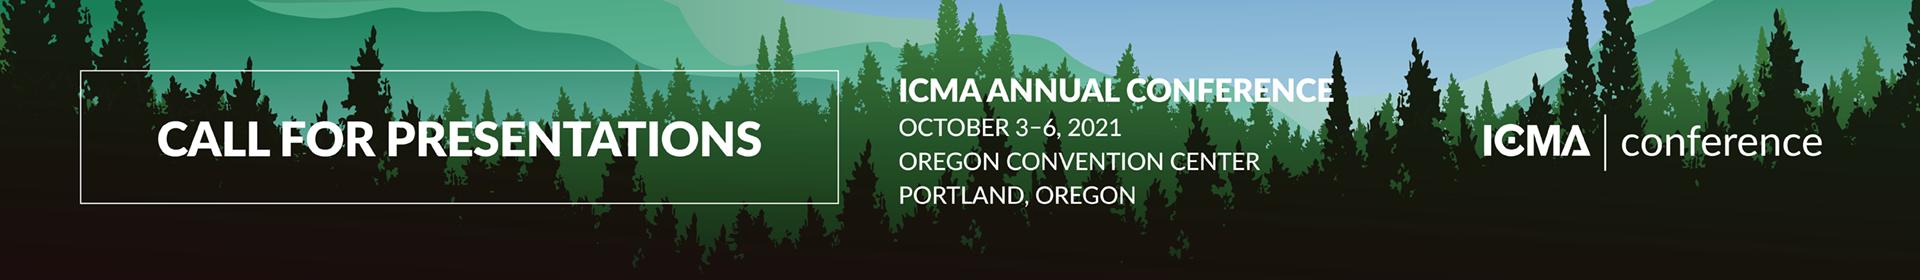 2021 ICMA Annual Conference Event Banner